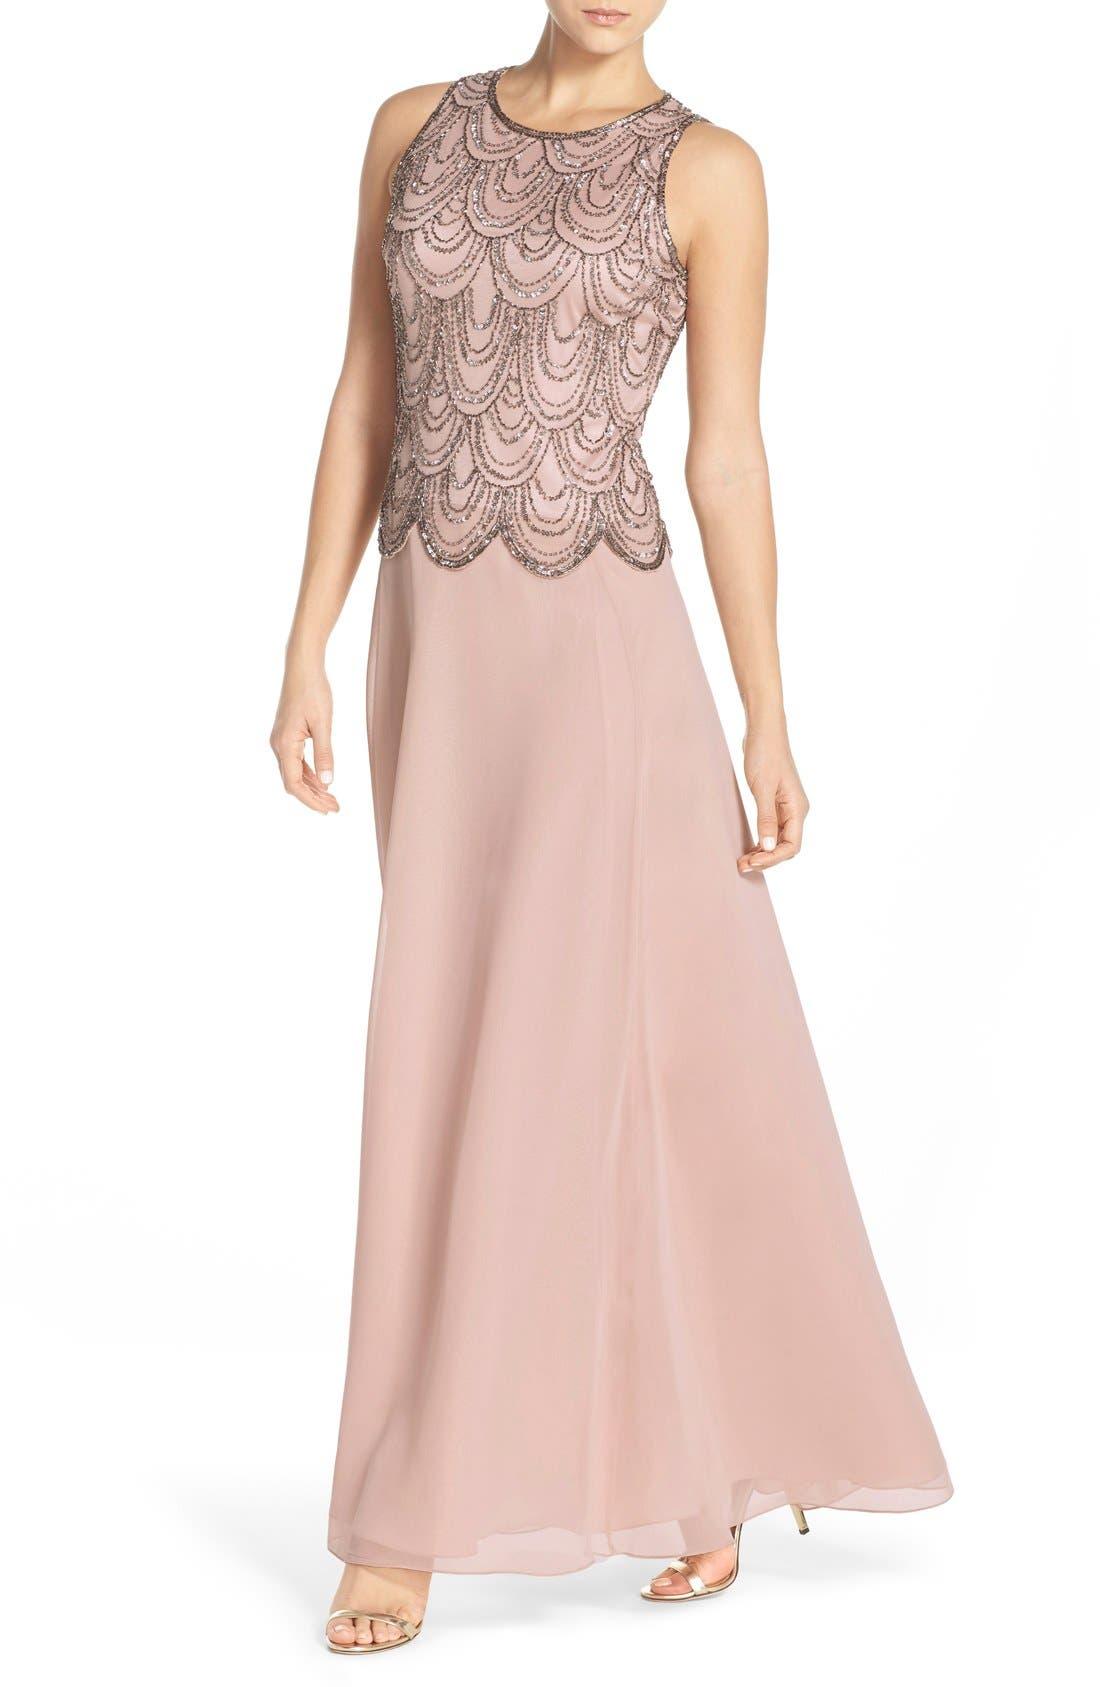 Alternate Image 1 Selected - J Kara Scallop Embellished Popover Chiffon Gown